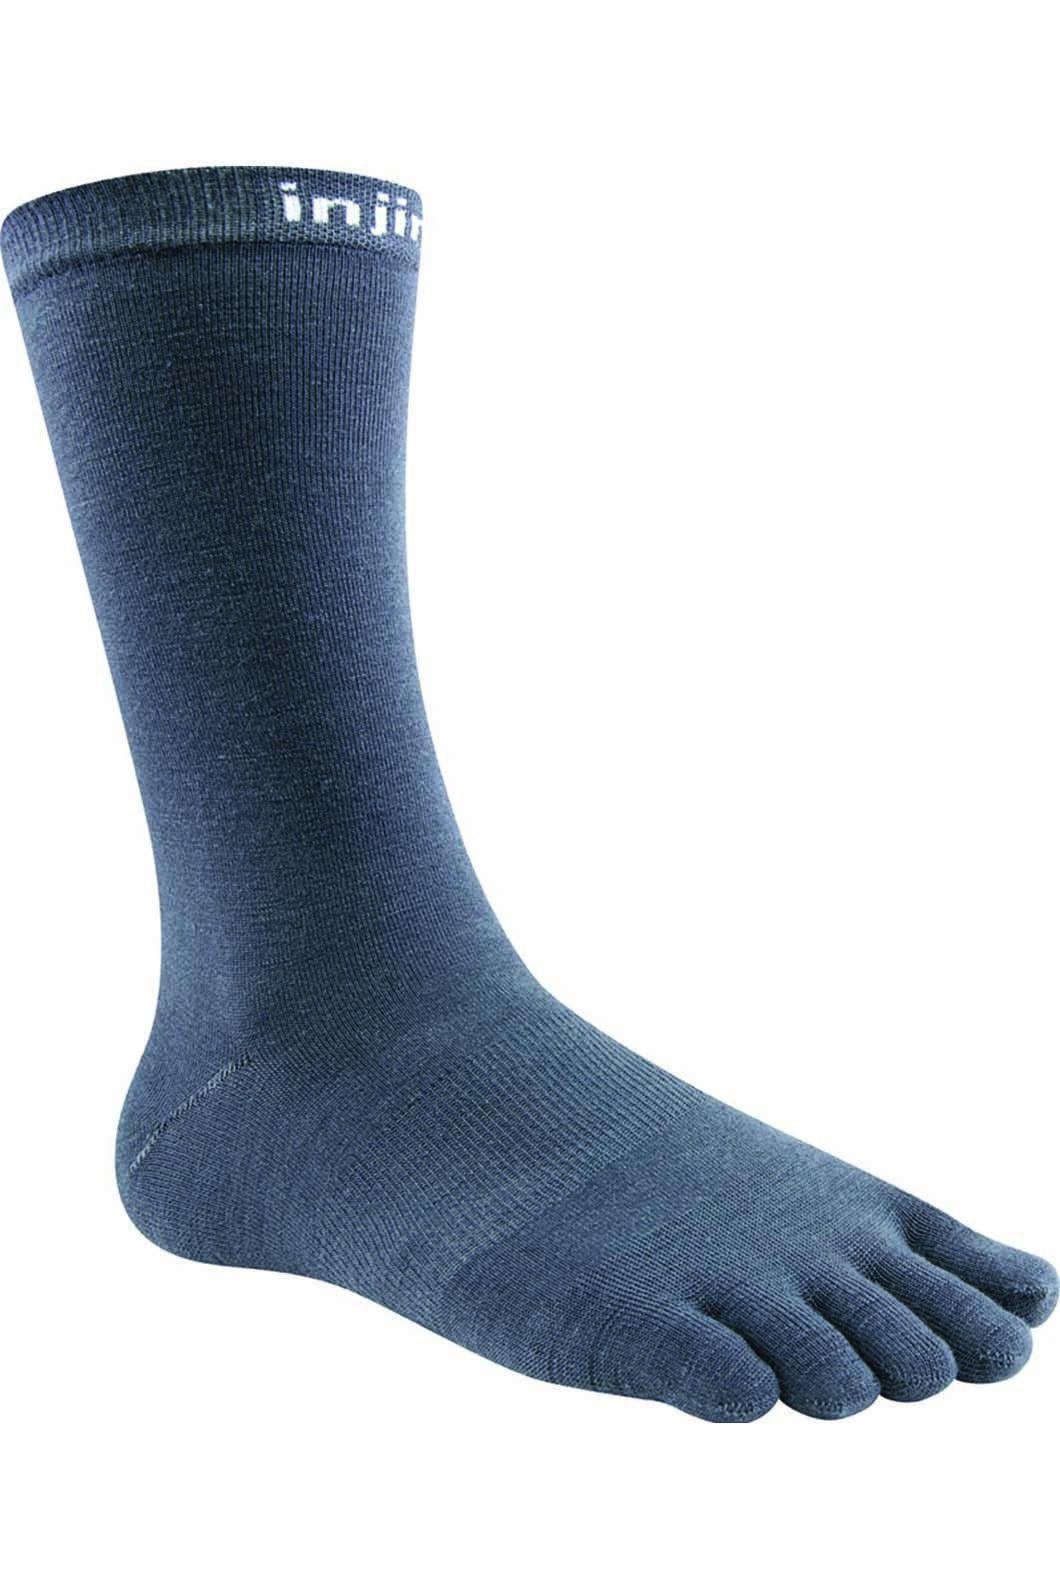 Injinji Unisex NuWool Sock Liner, Charcoal, hi-res